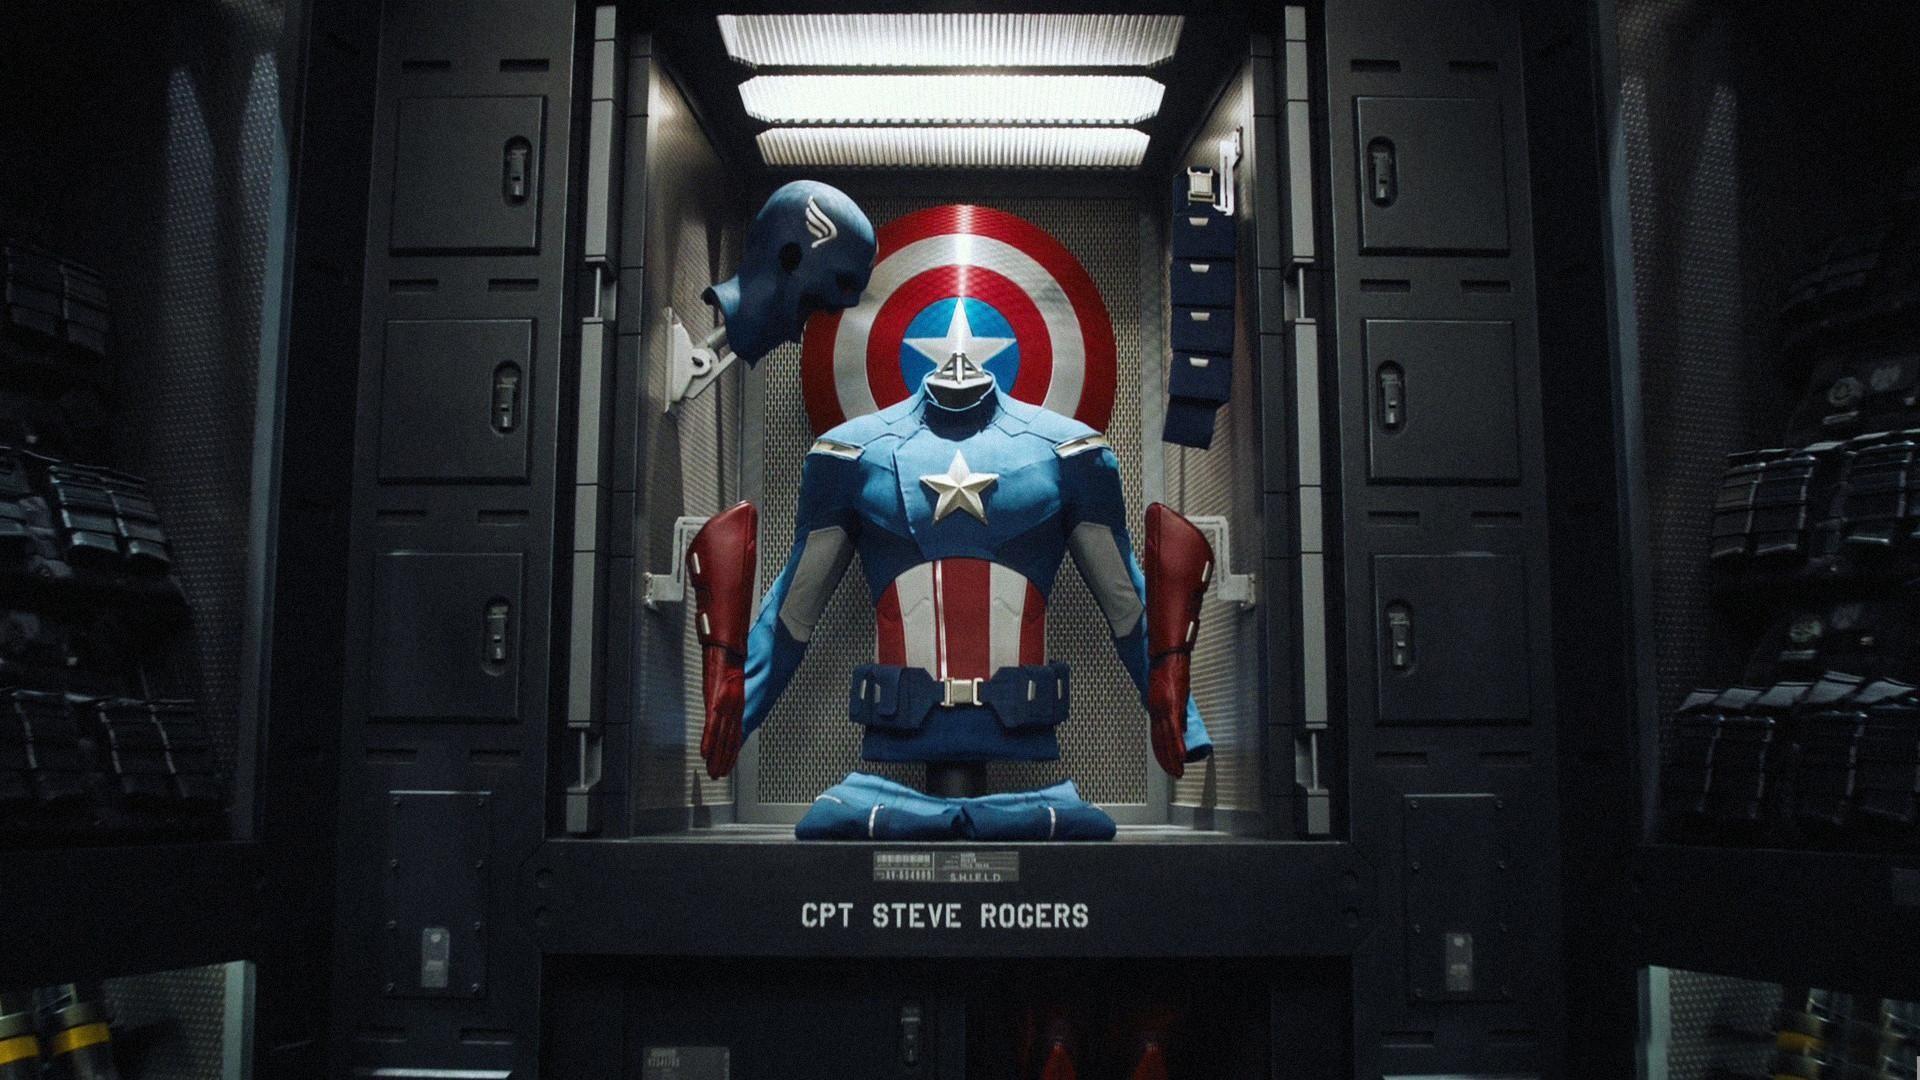 the avengers wallpapers movie best hd 1080p hd desktop